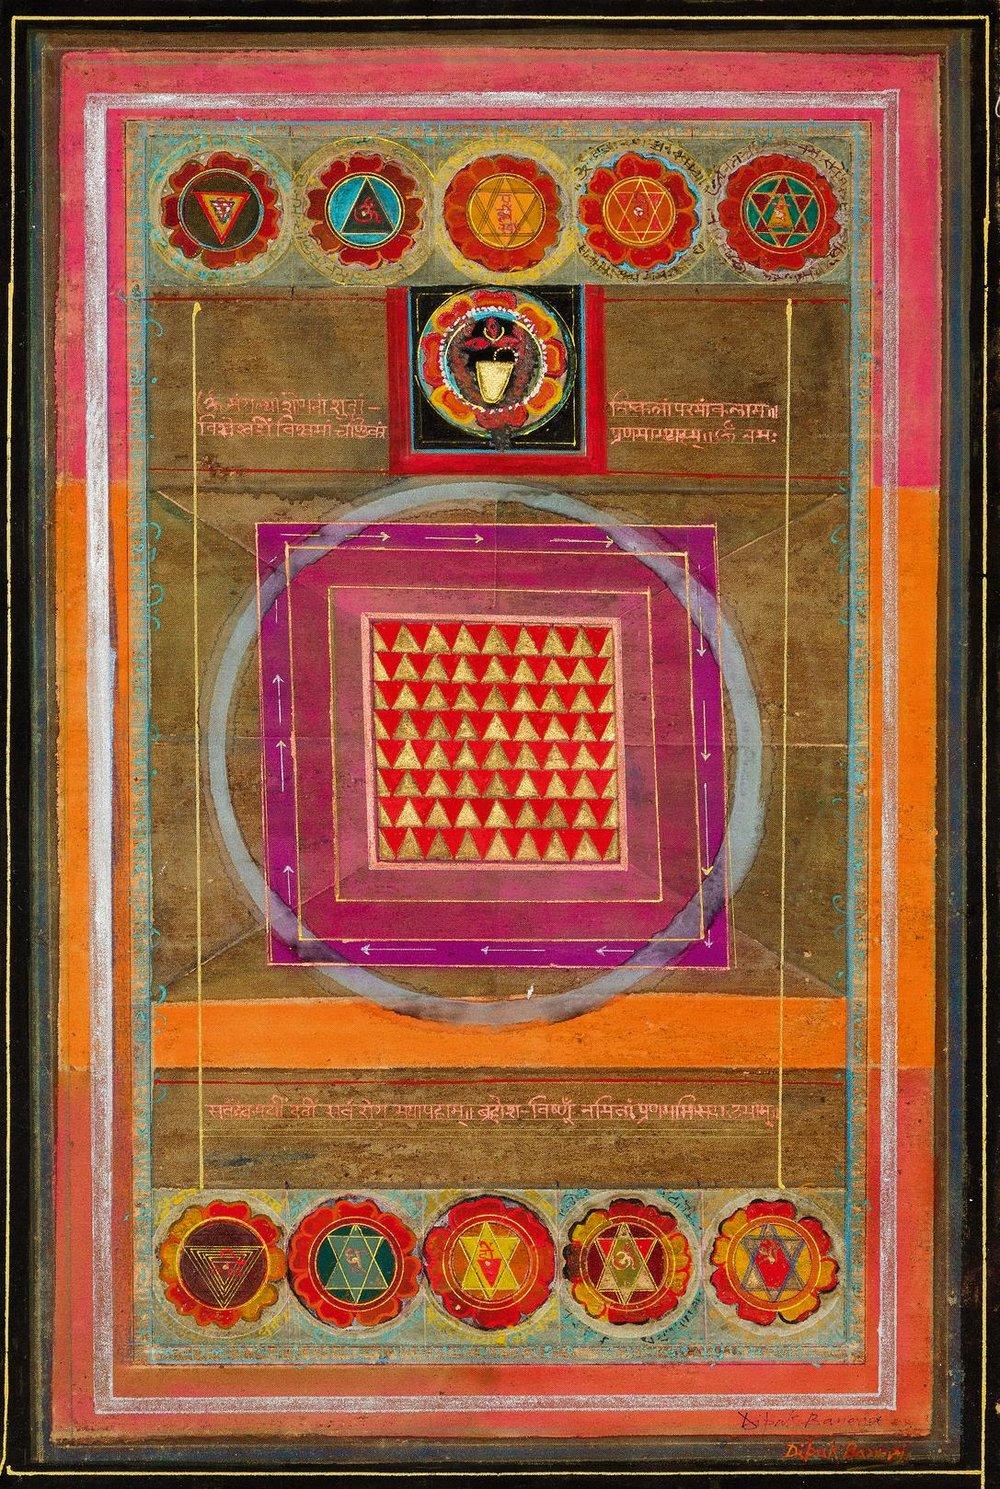 Dipak Banerjee-Tara-O-Chasath Yogini-28.3 in x 18.2in-(71.9 cm x 46.2 cm)-Mixed Media on Canvas.JPG